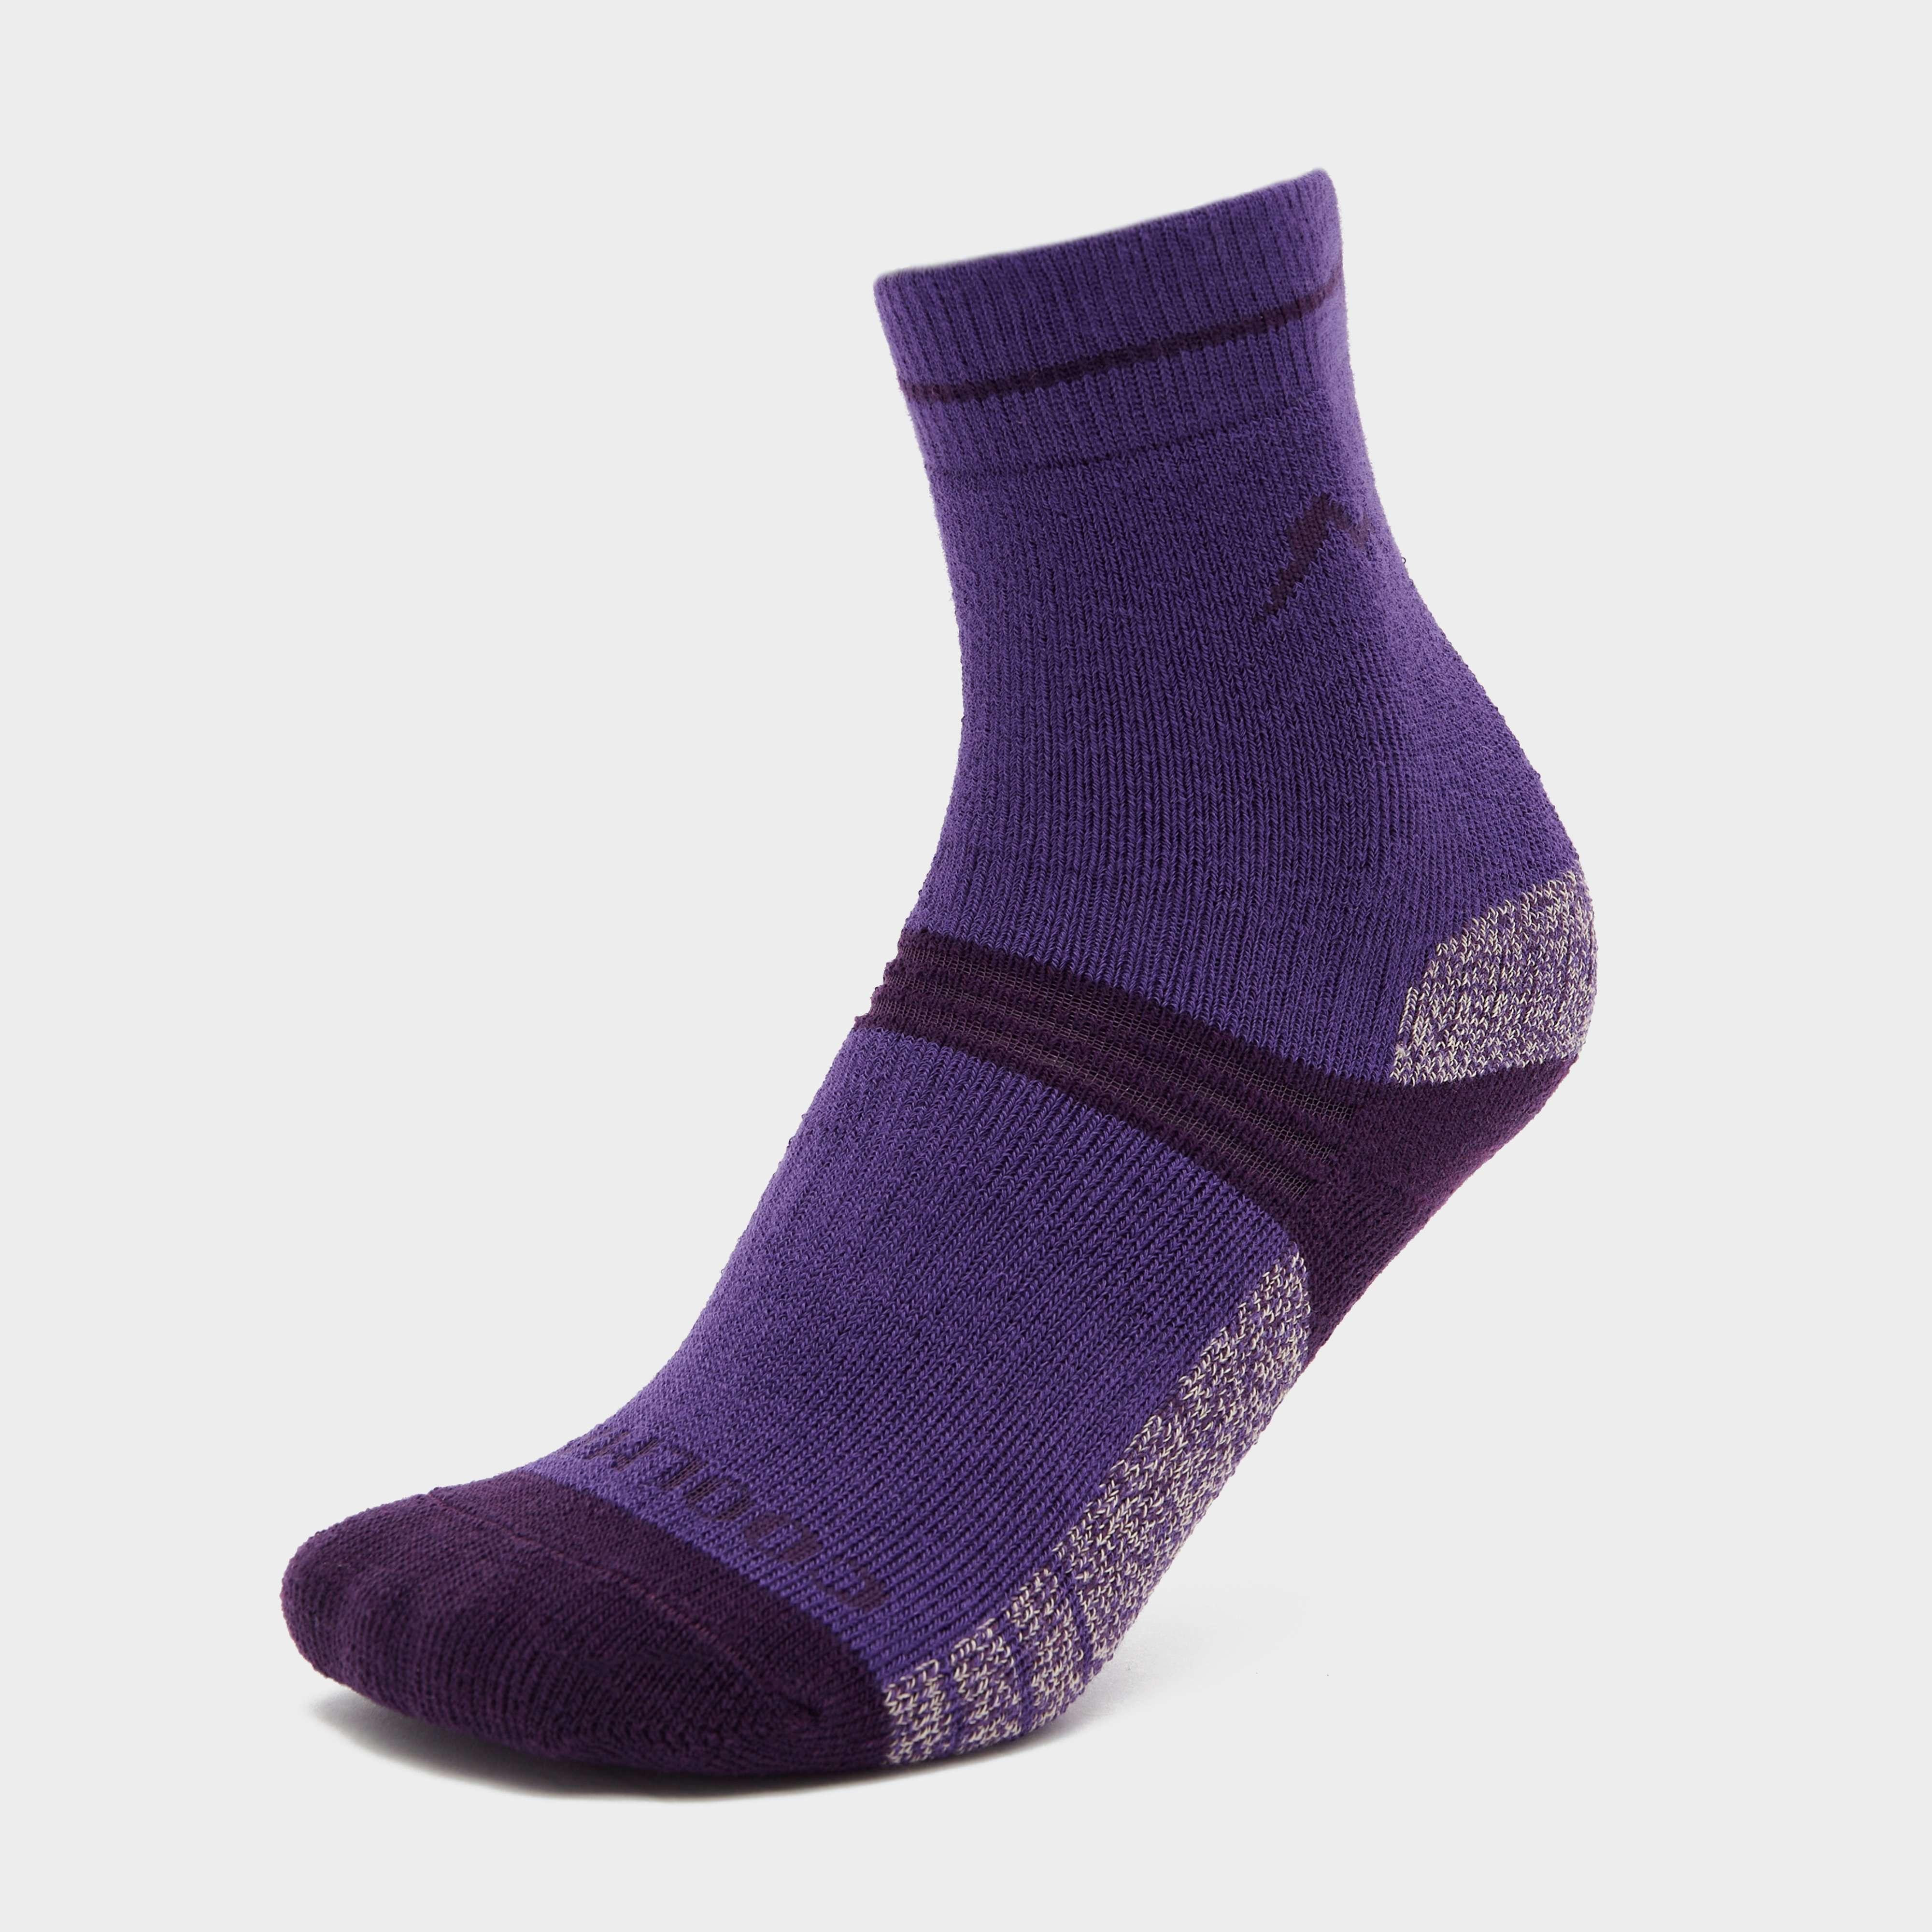 PETER STORM Girl's Midweight  Trekking Sock (2 pack)